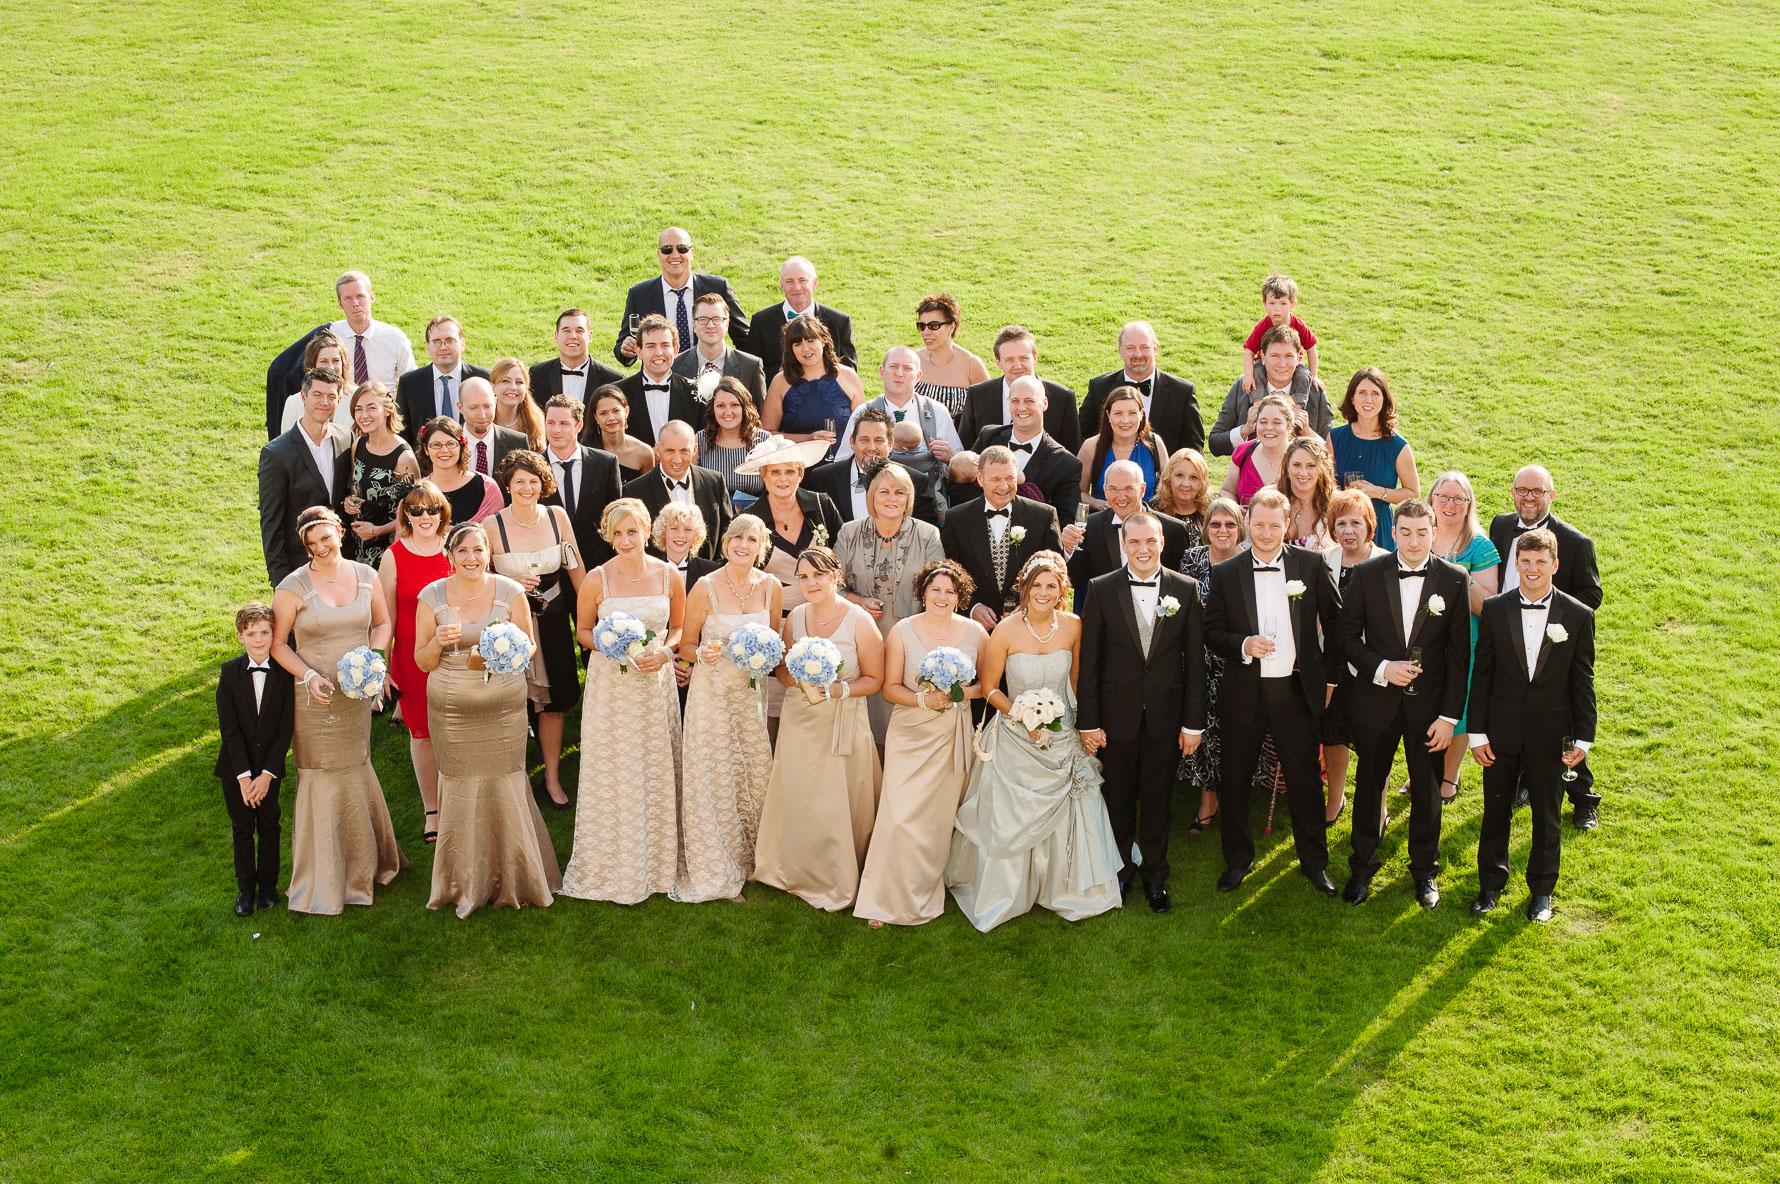 Leeds Castle Wedding28-20140919 0754